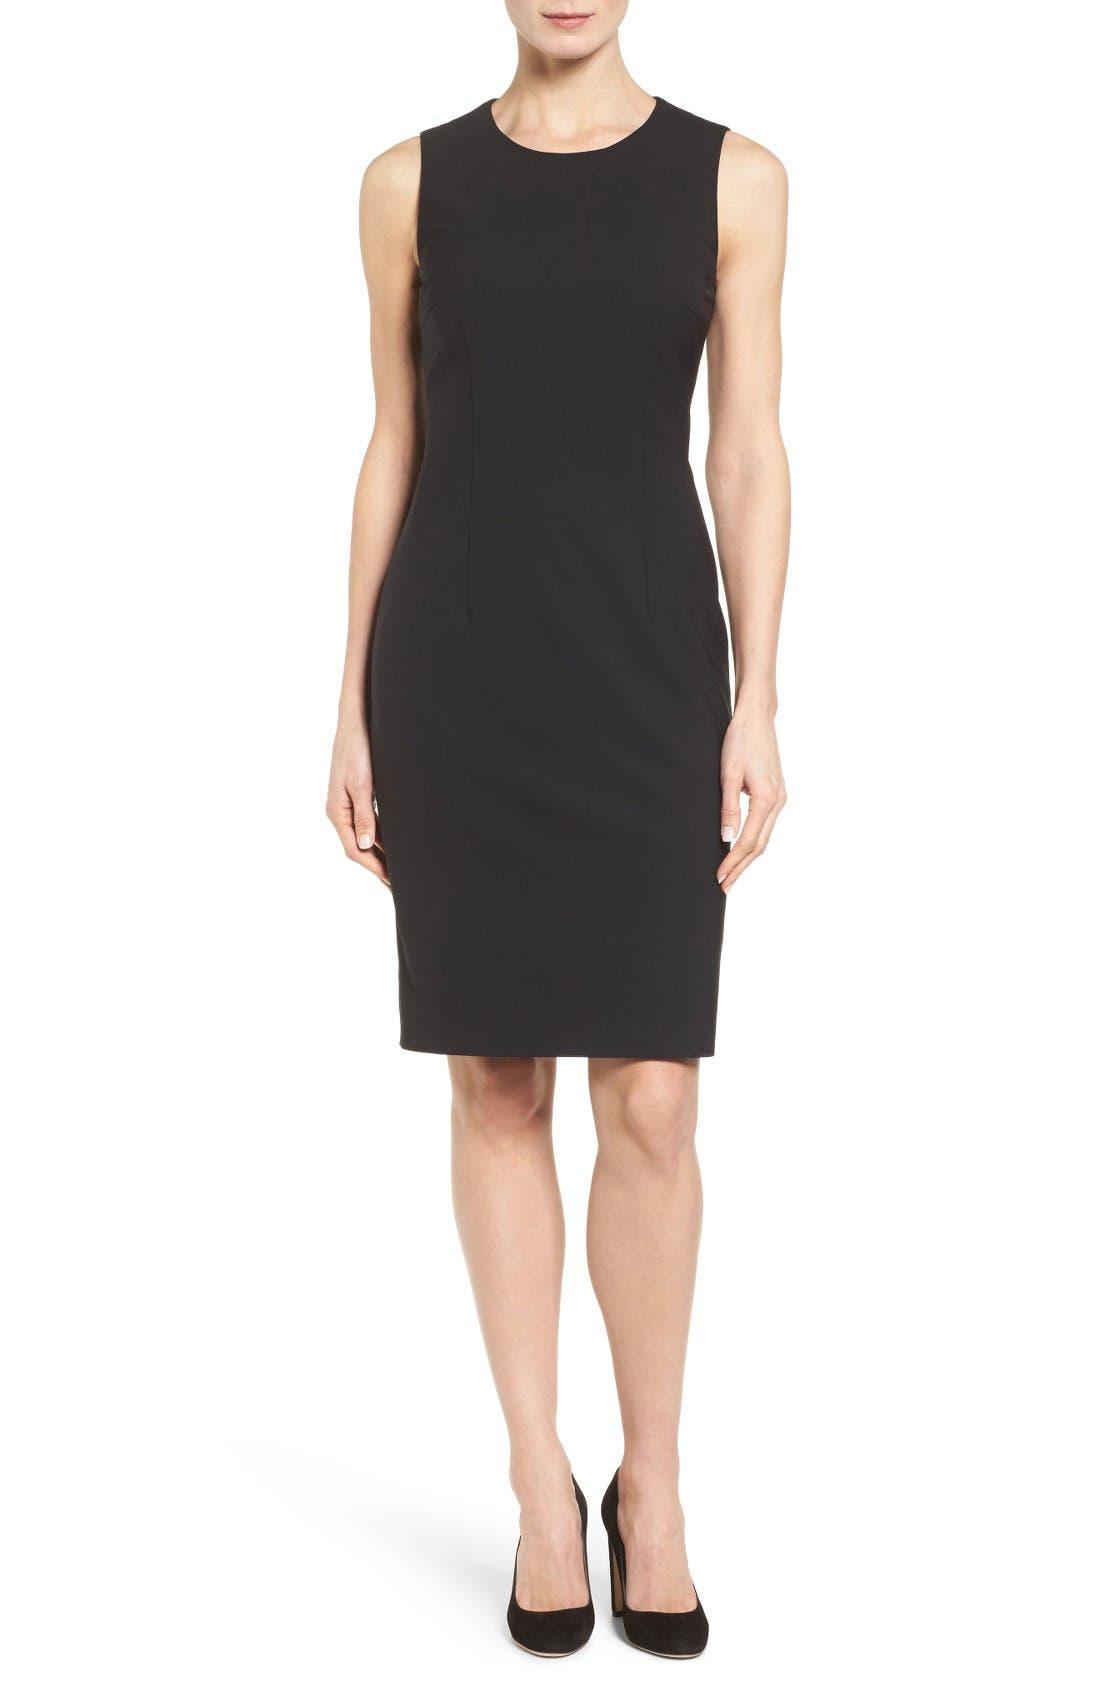 Alternate Image 1 Selected - BOSS Dirusa Sleeveless Stretch Wool Sheath Dress